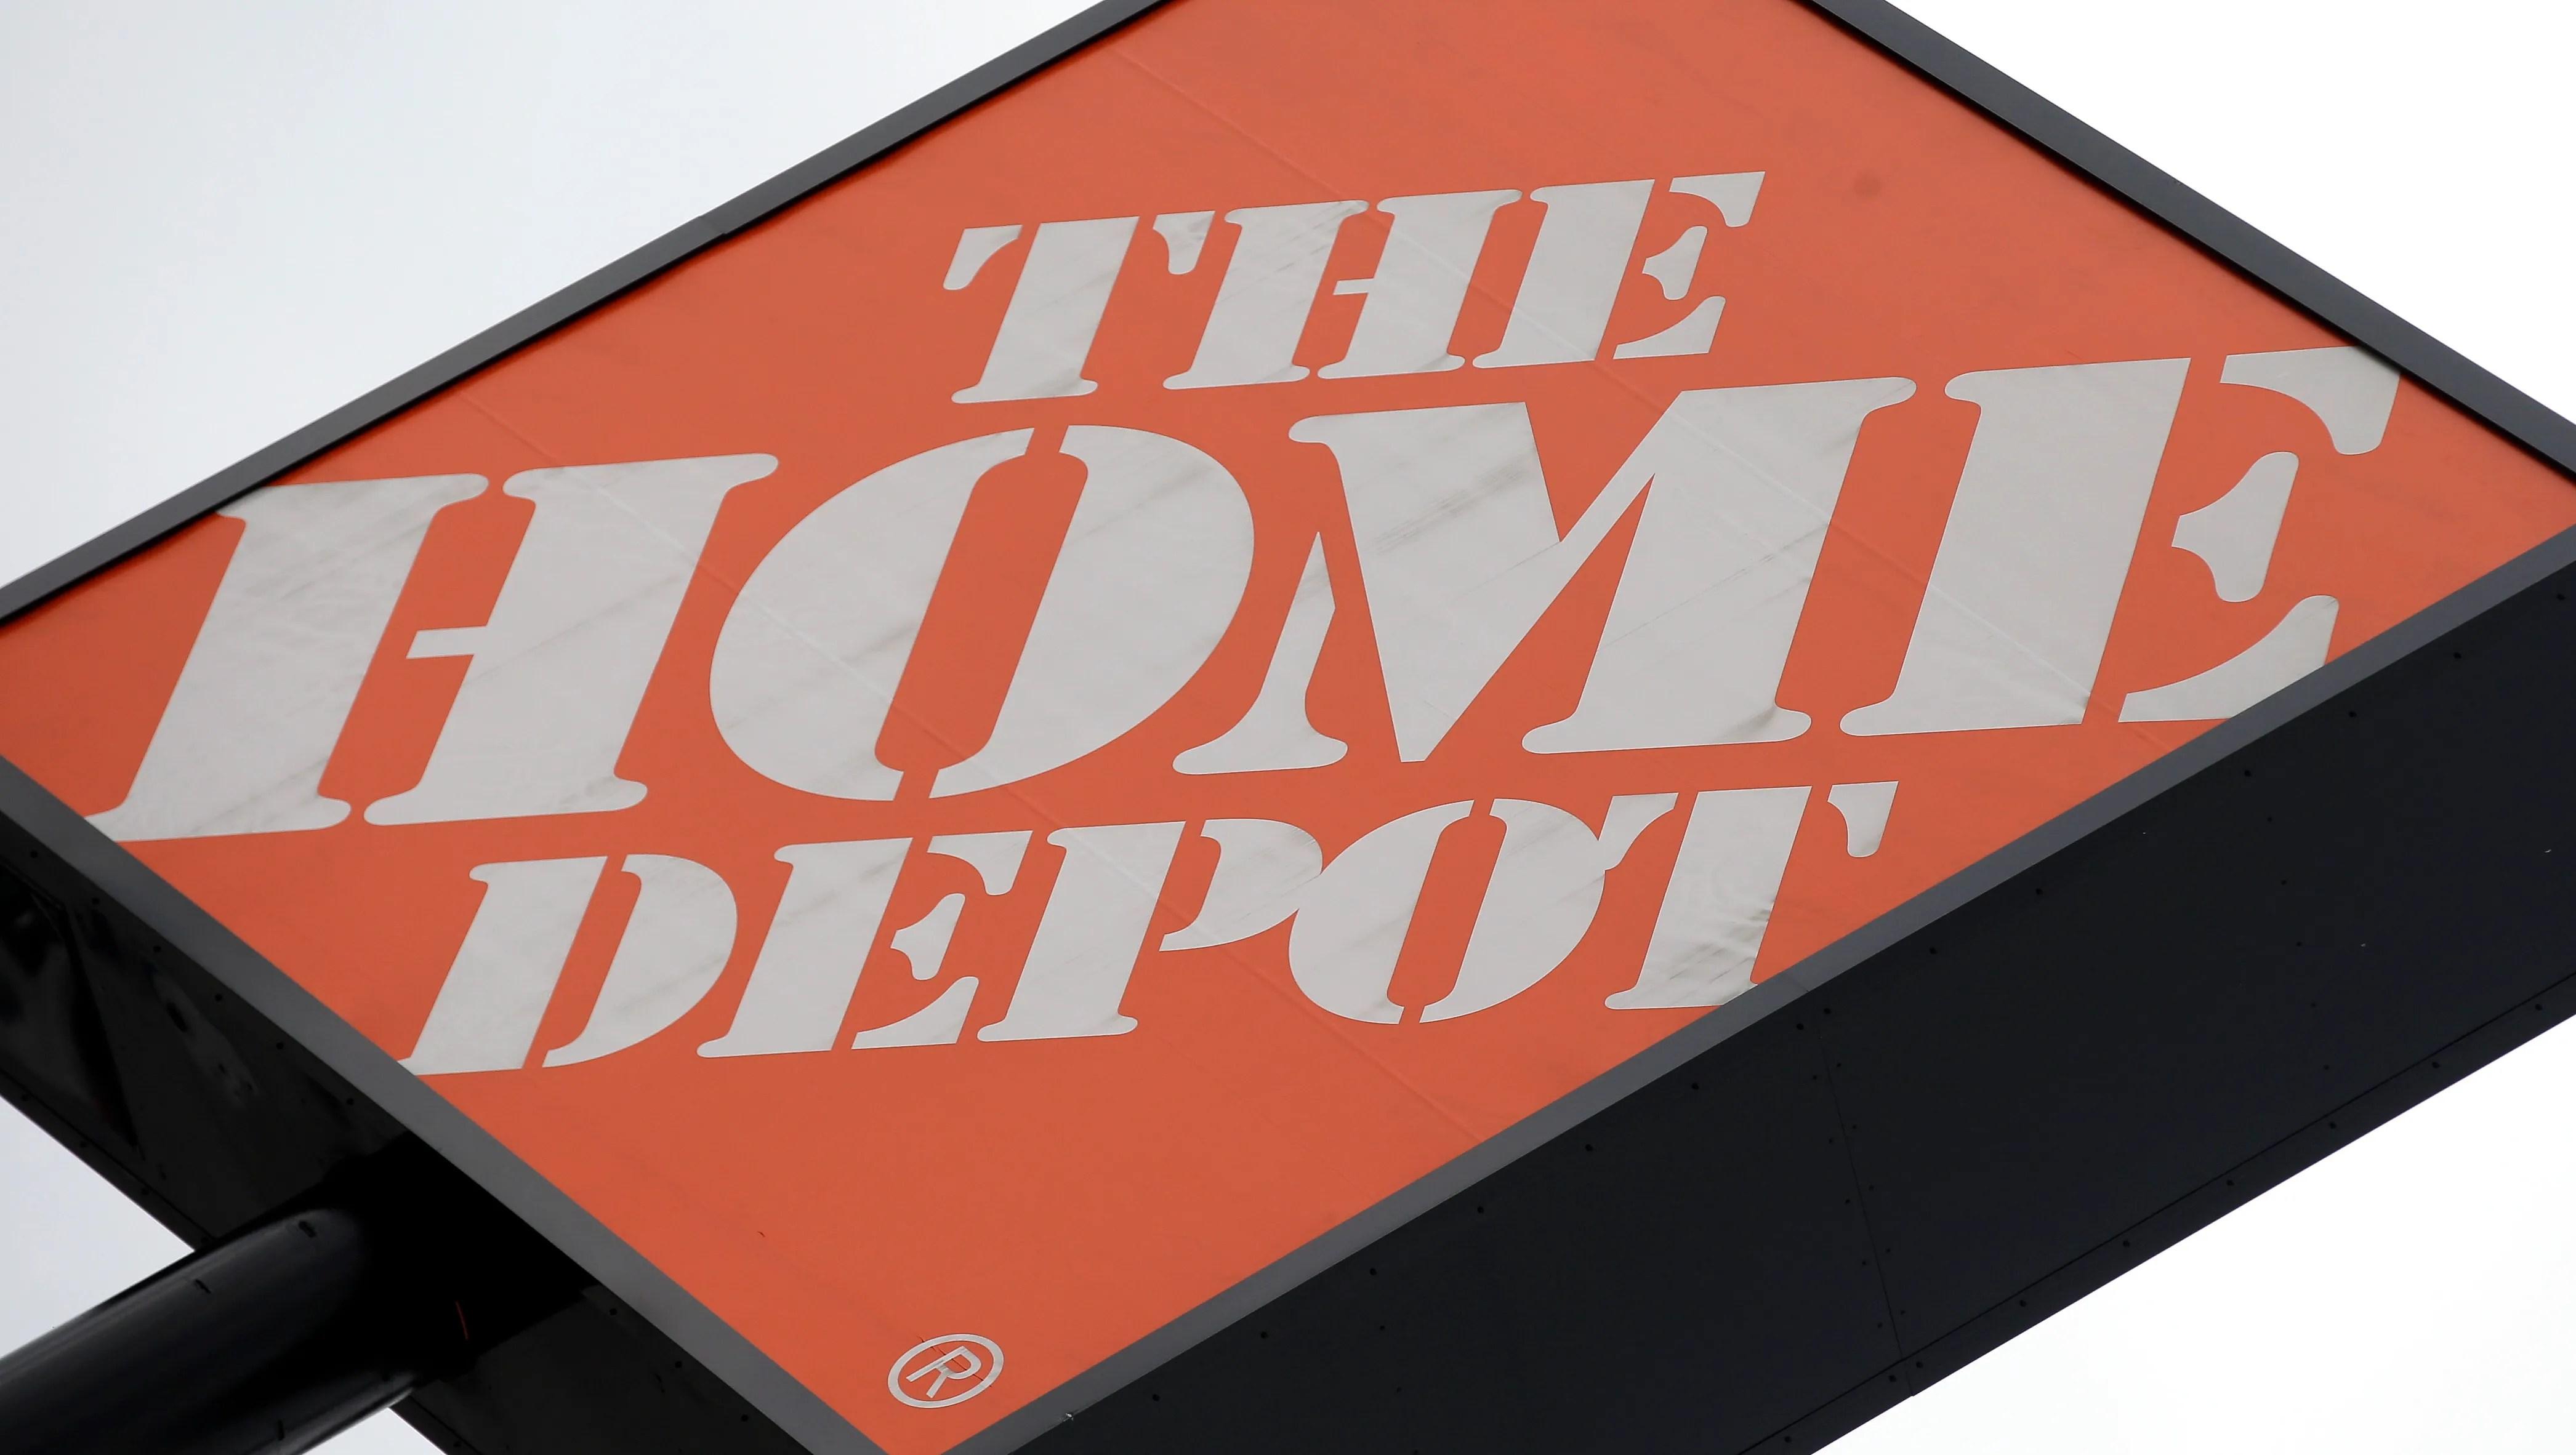 Home Depot Decor Textiles -tailer Company Store